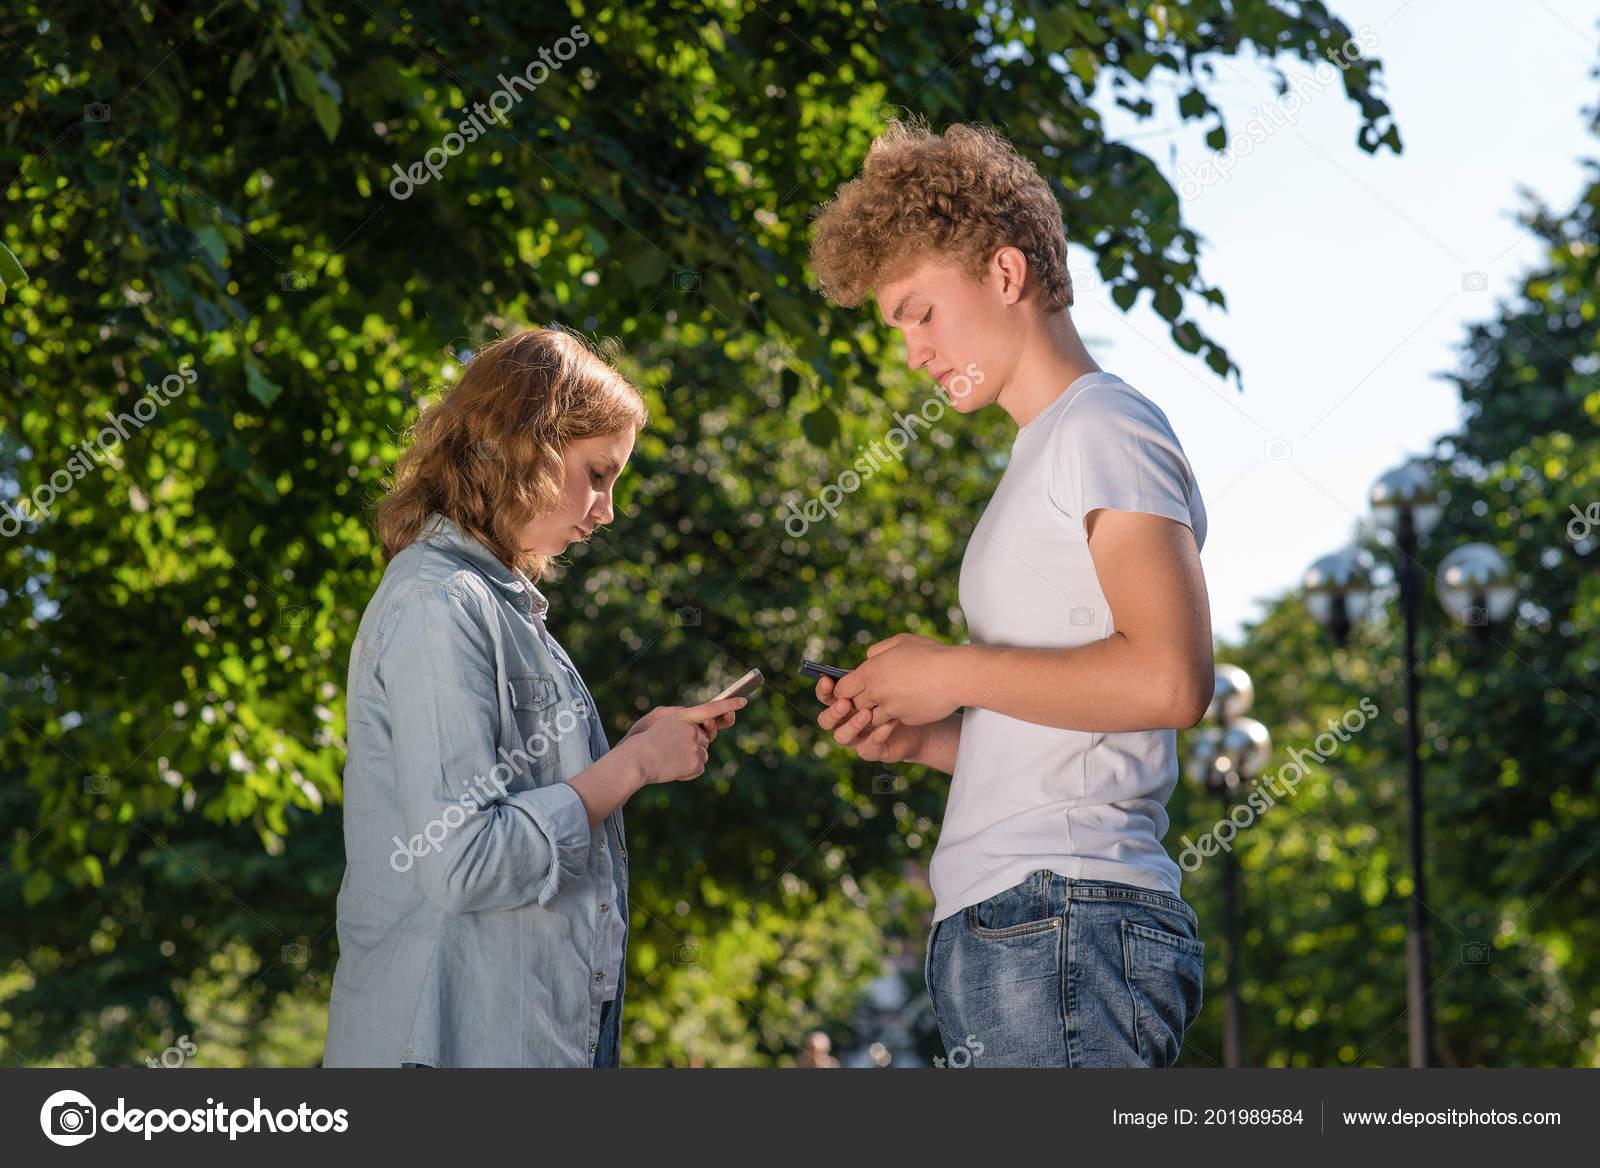 christian speed dating birmingham uk